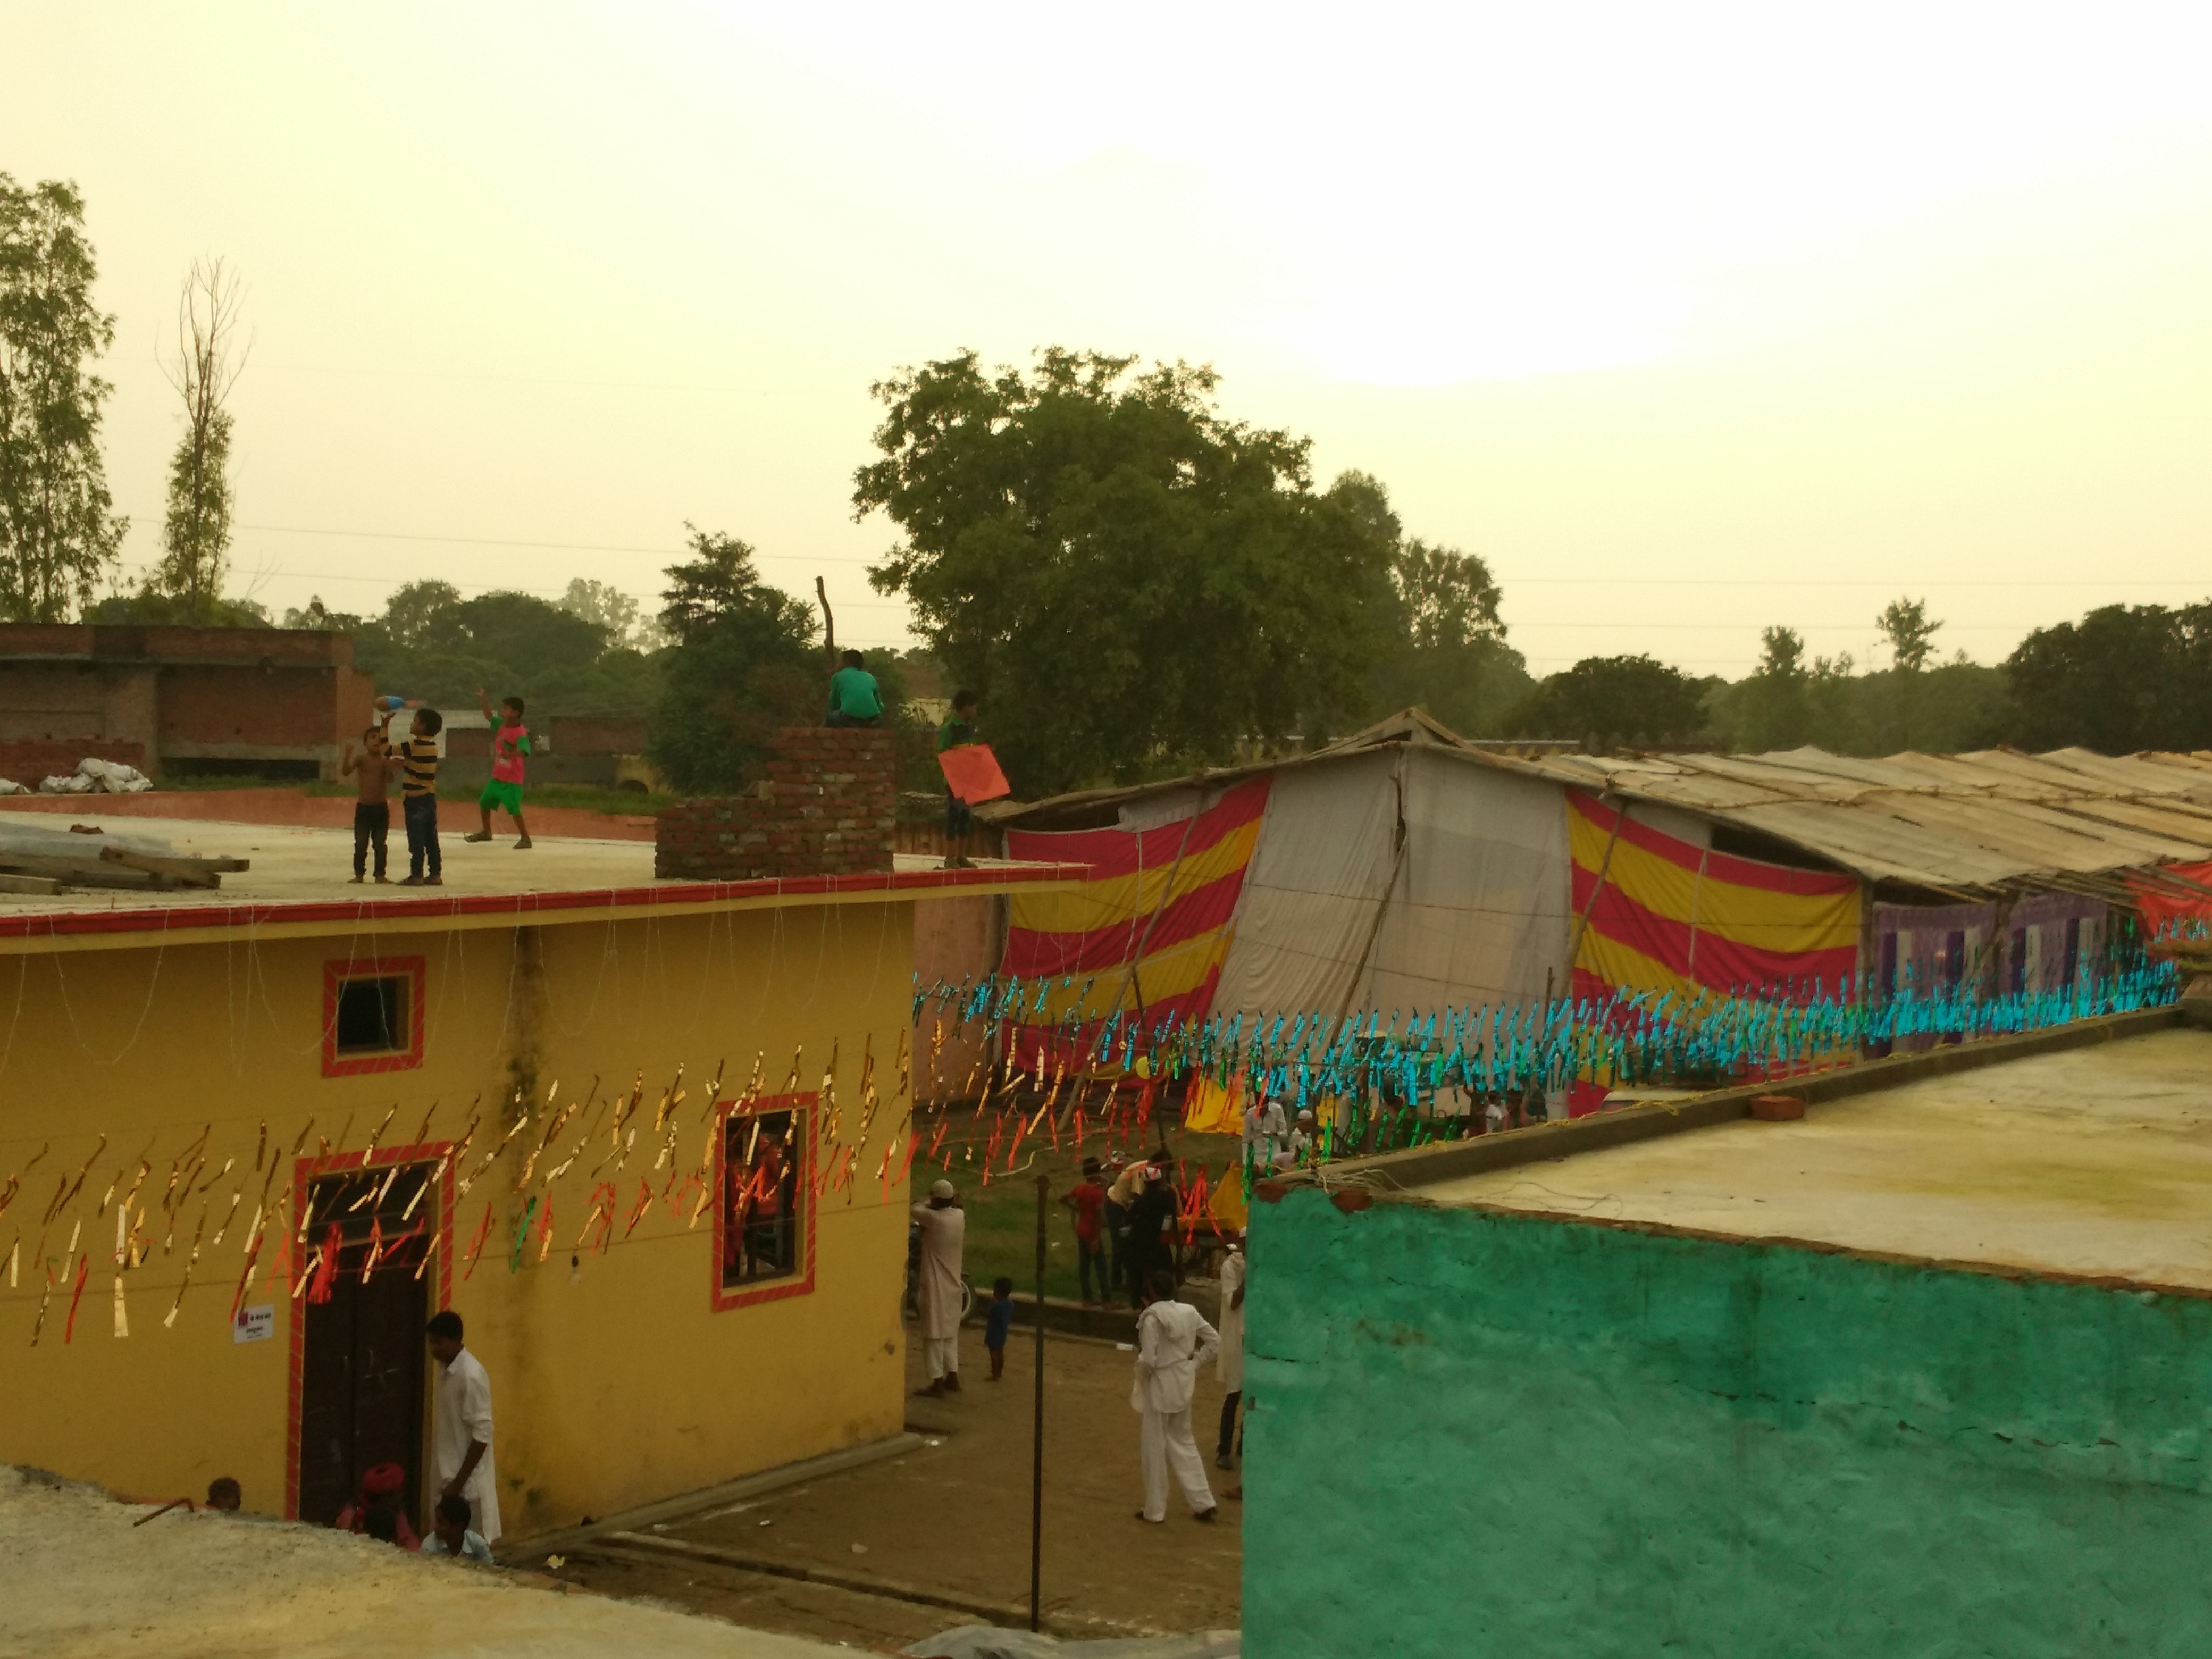 Apna Ghar Colony decorated for the official inauguration. Credit: Jahnavi Sen